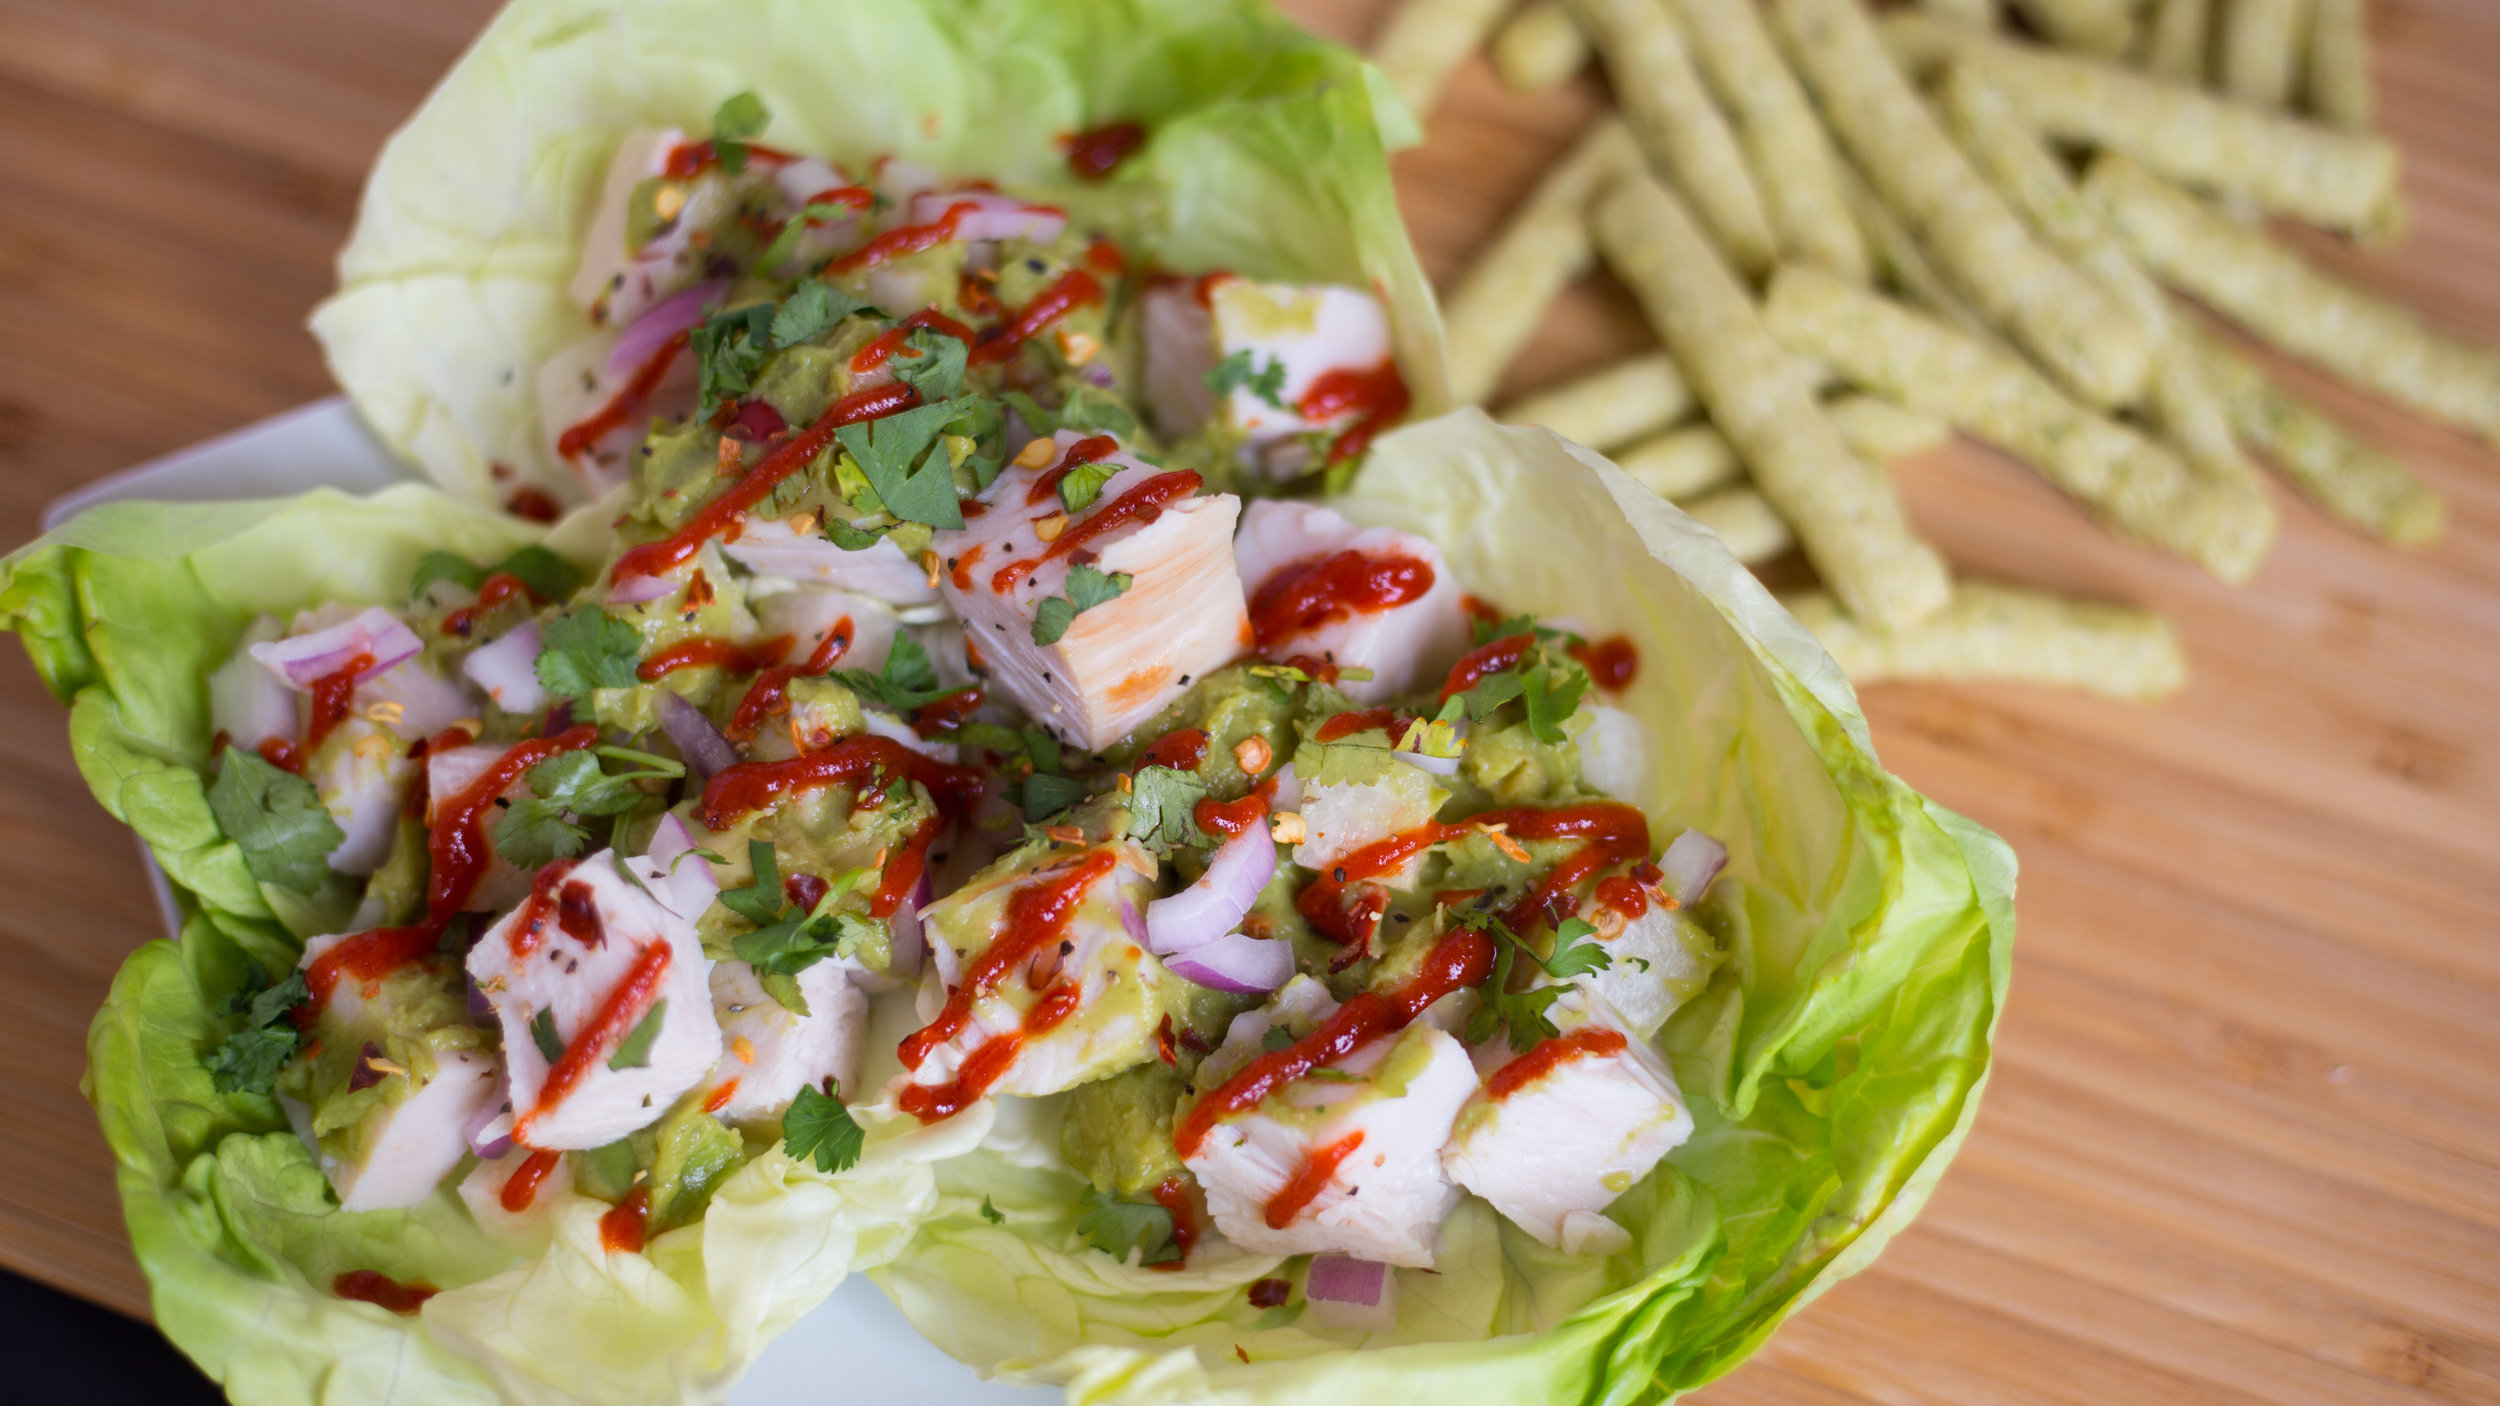 Spicy Turkey Lettuce Wrap 16x9.jpg